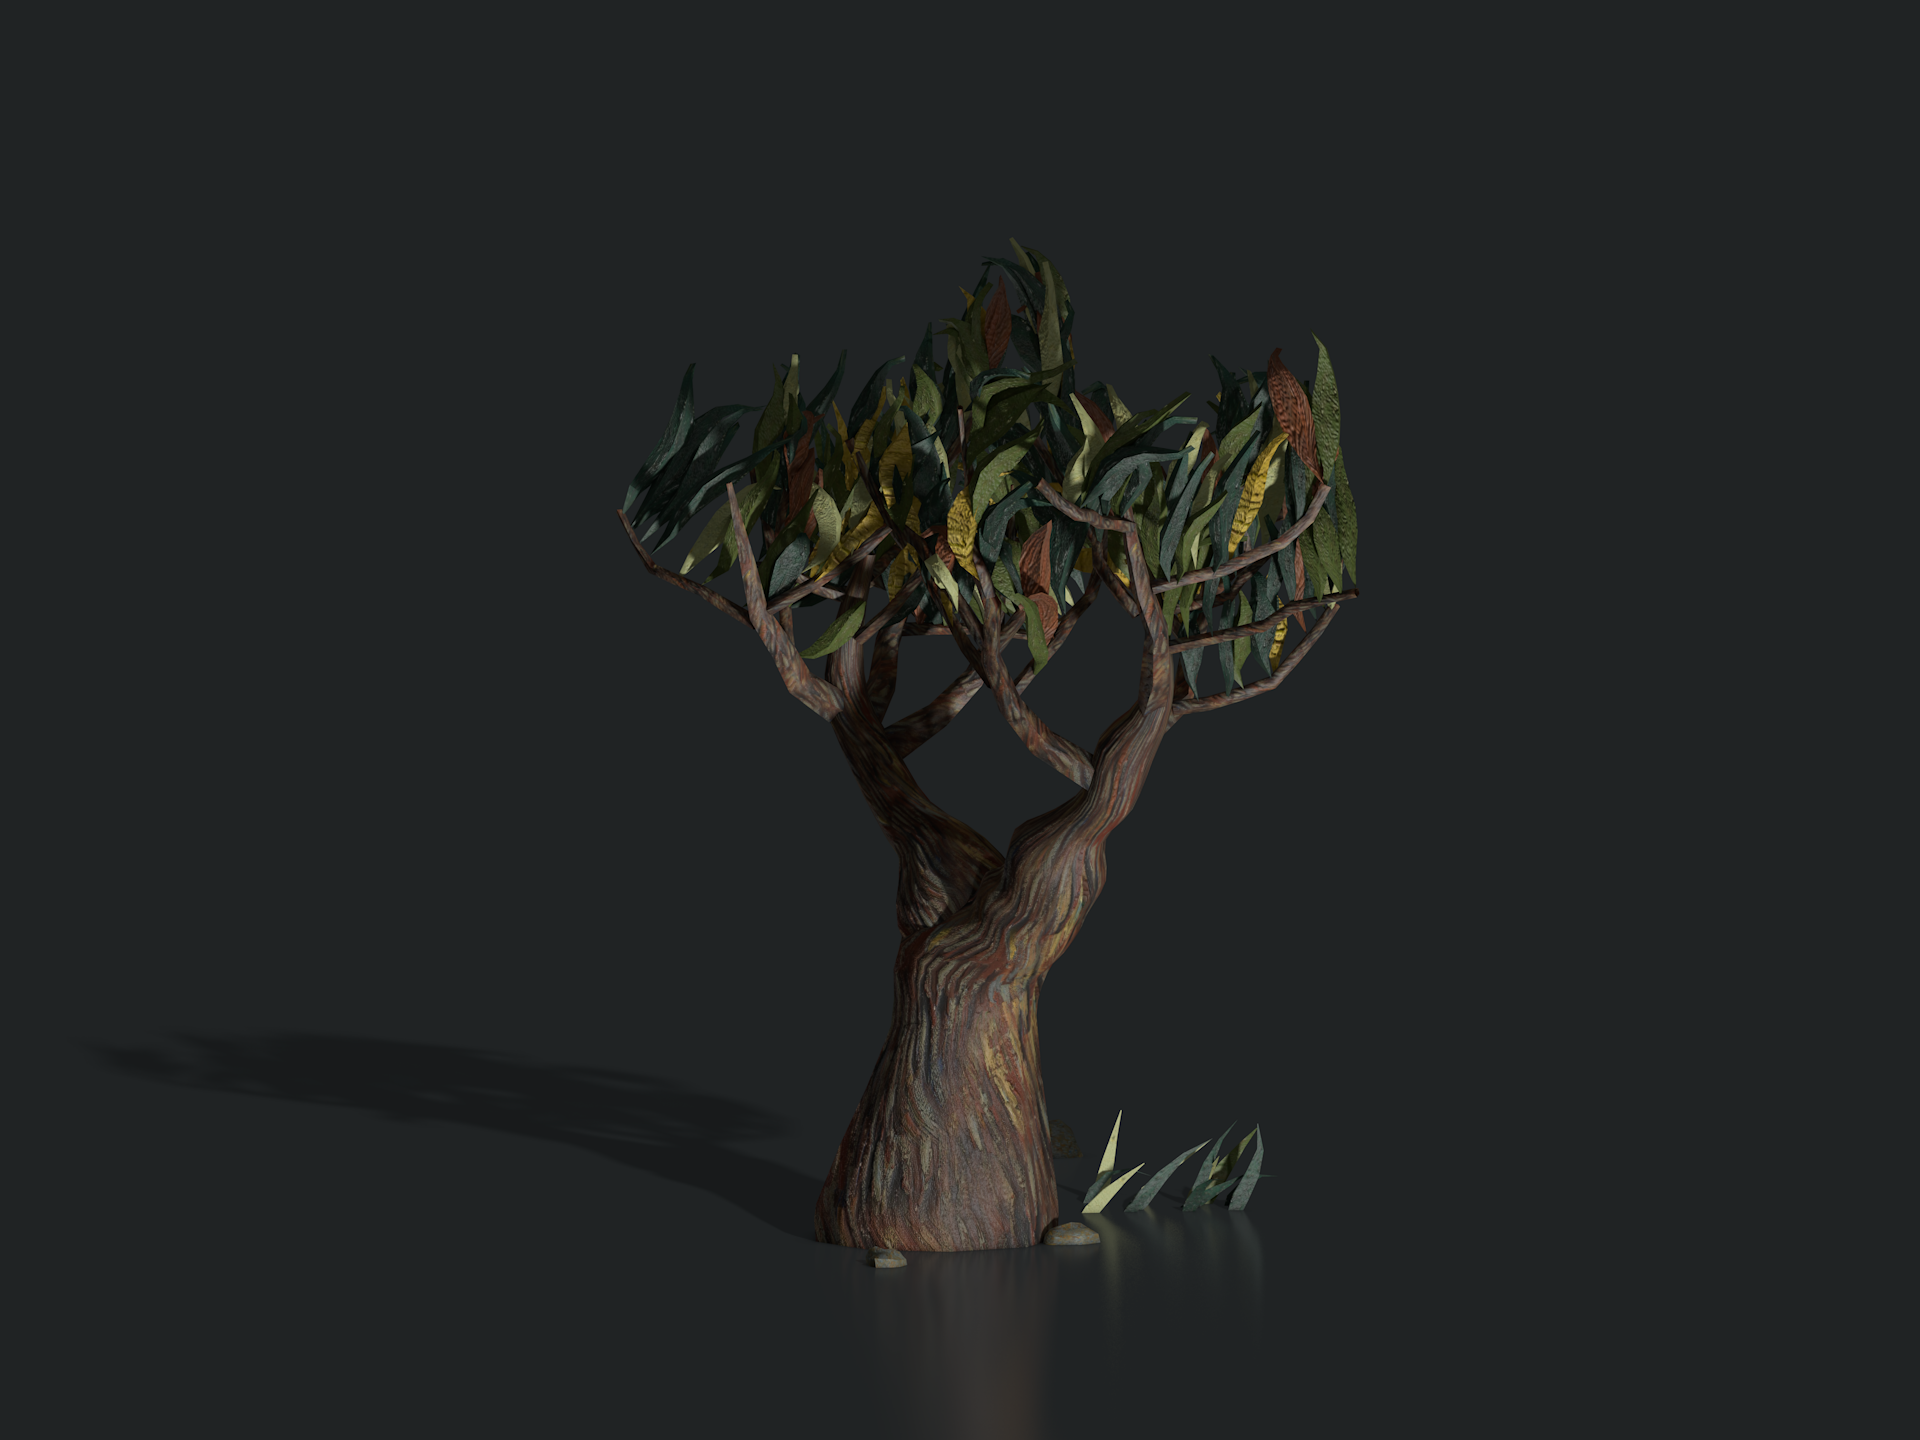 plants_saint_remy_tree1303.png